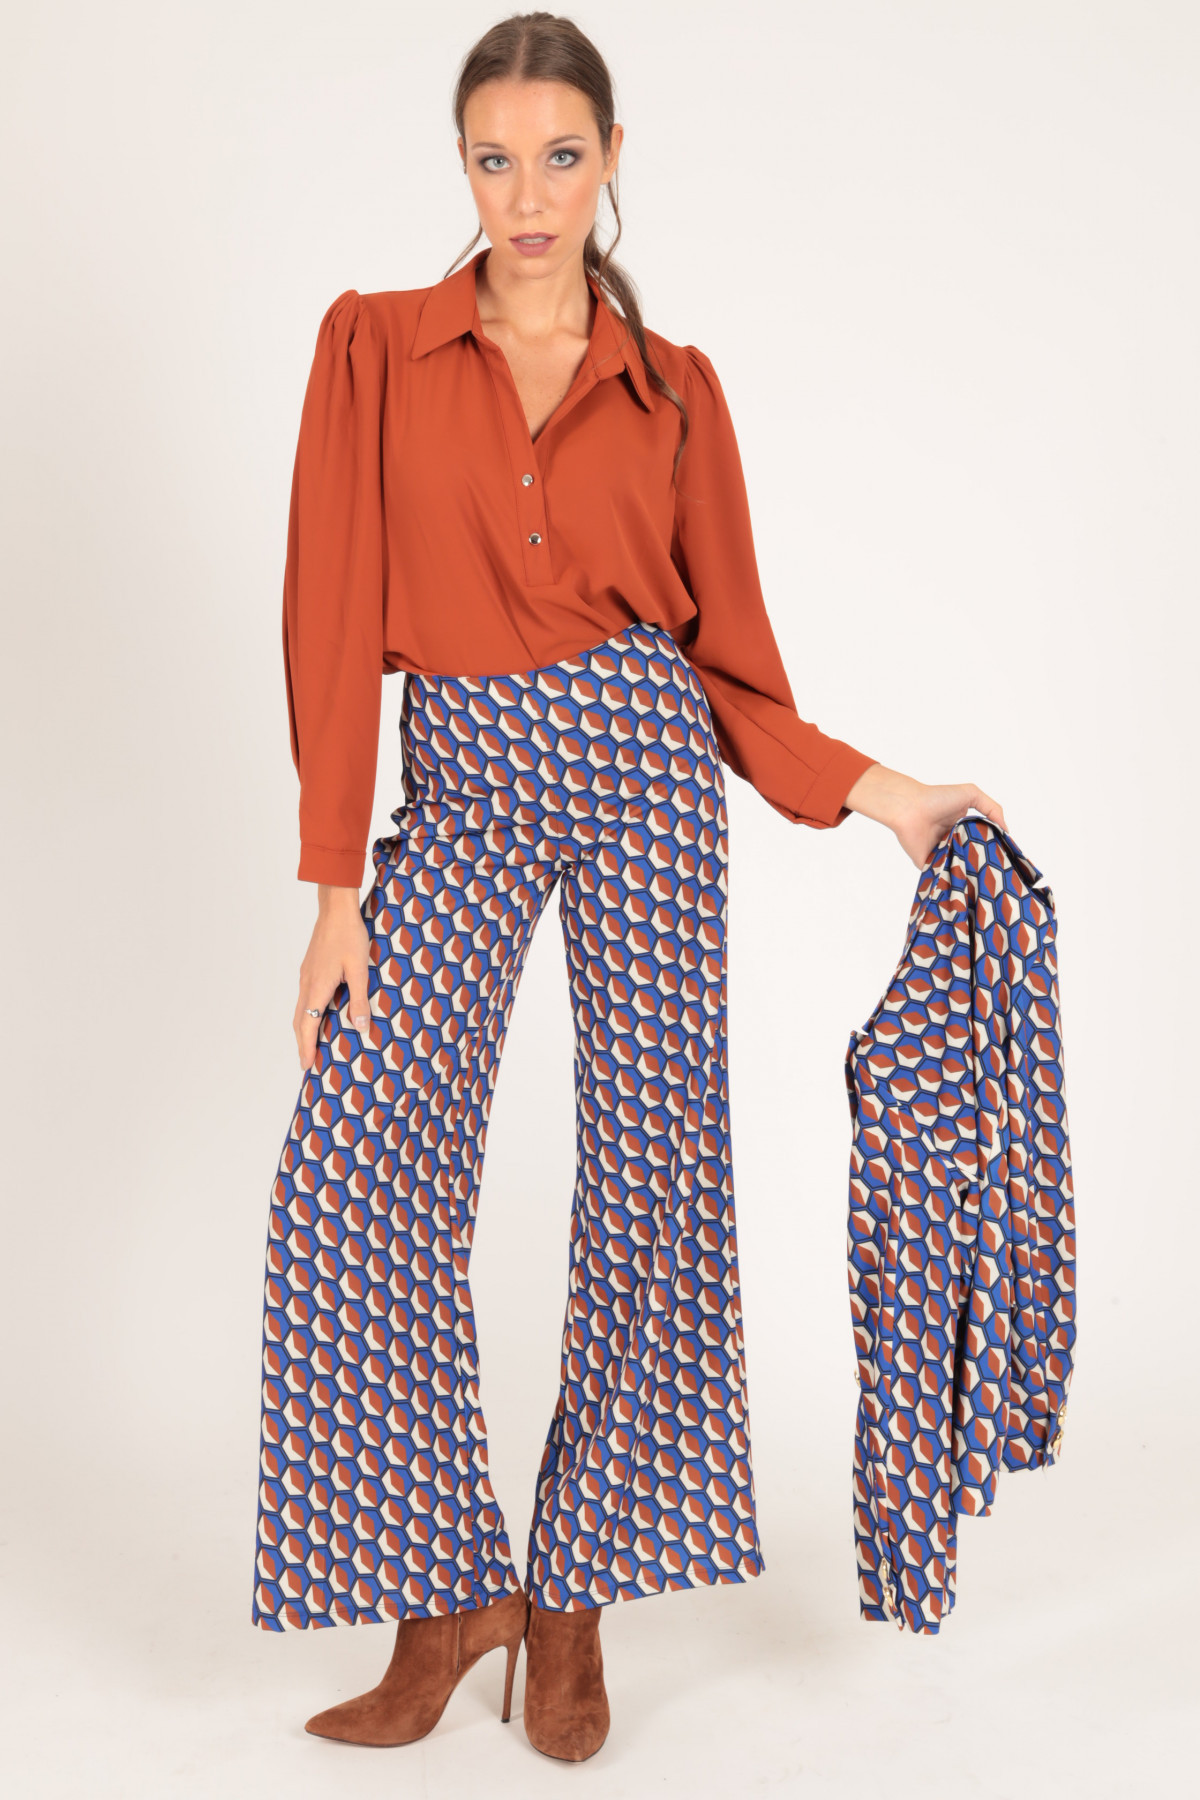 Pantaloni a Zampa in Stampa Fantasia Optical